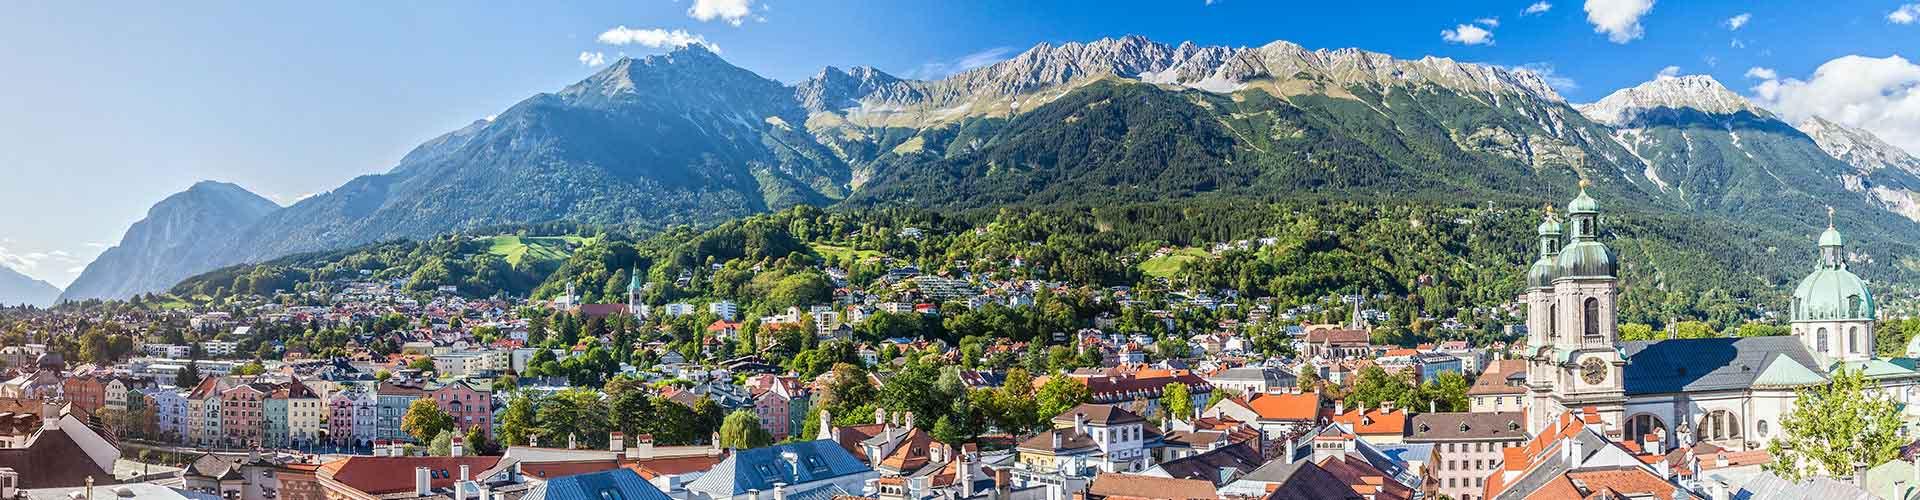 Innsbruck - Campamentos en Innsbruck. Mapas de Innsbruck, Fotos y comentarios de cada Campamento en Innsbruck.